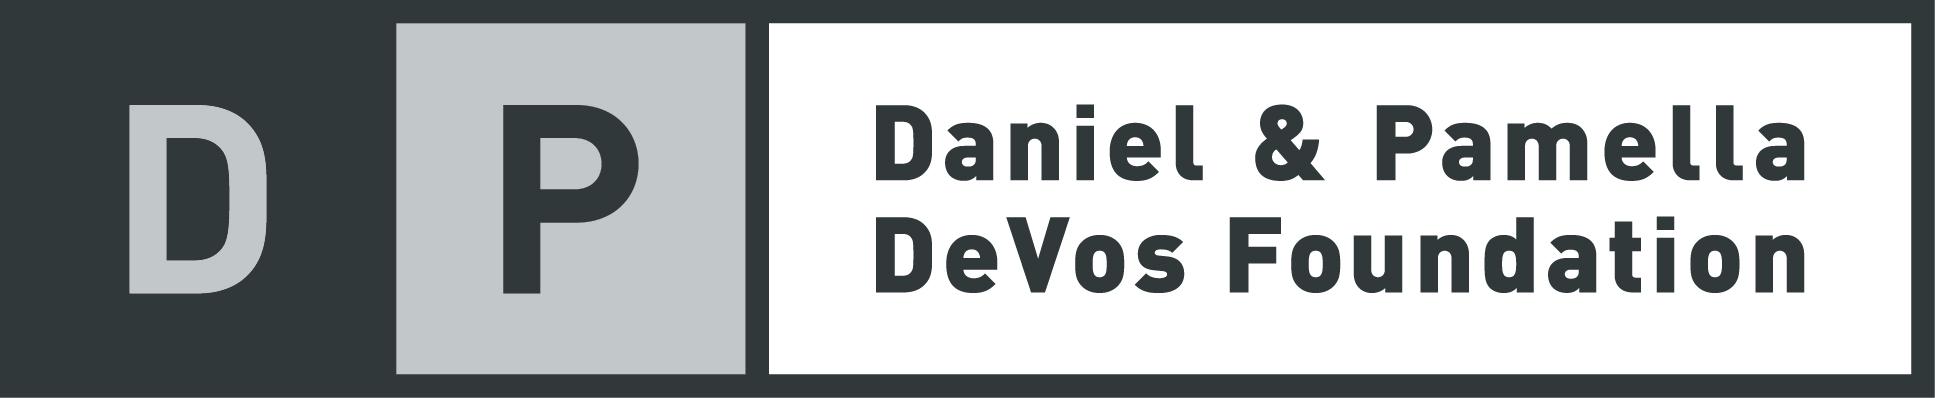 Daniel & Pamella DeVos Foundation Logo